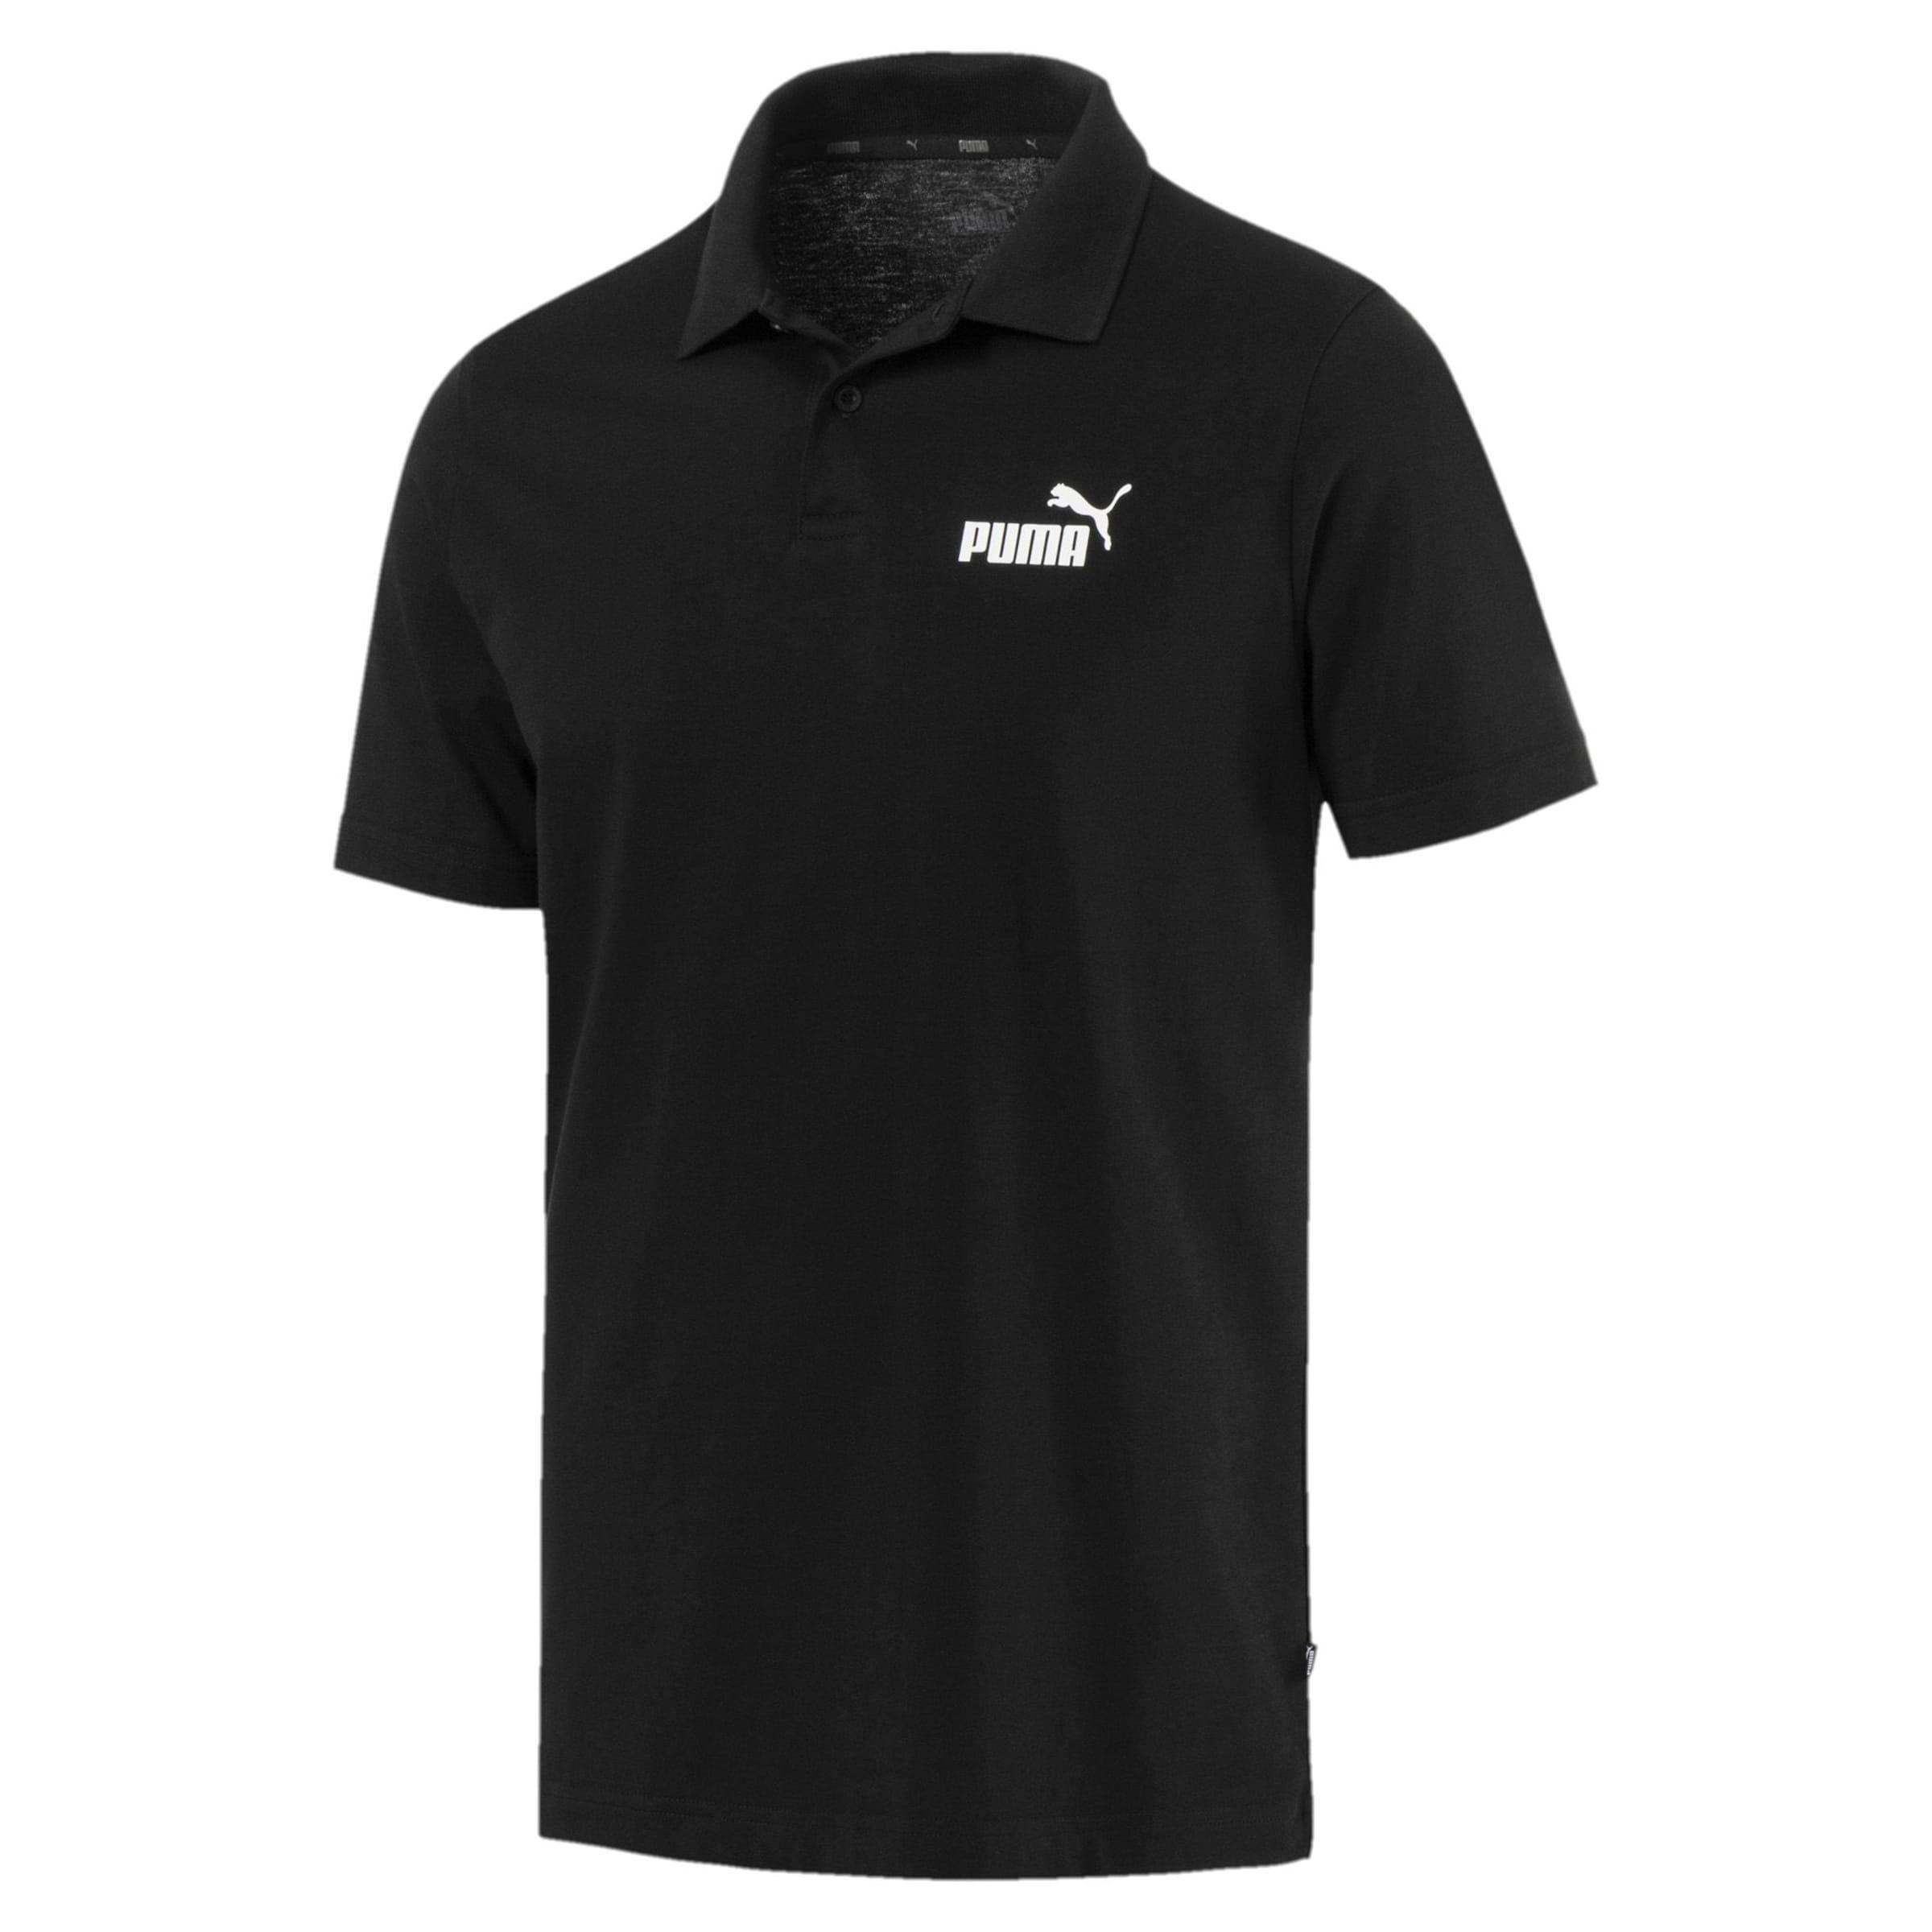 Puma 'essentials' T shirt En Noir xrBCoed